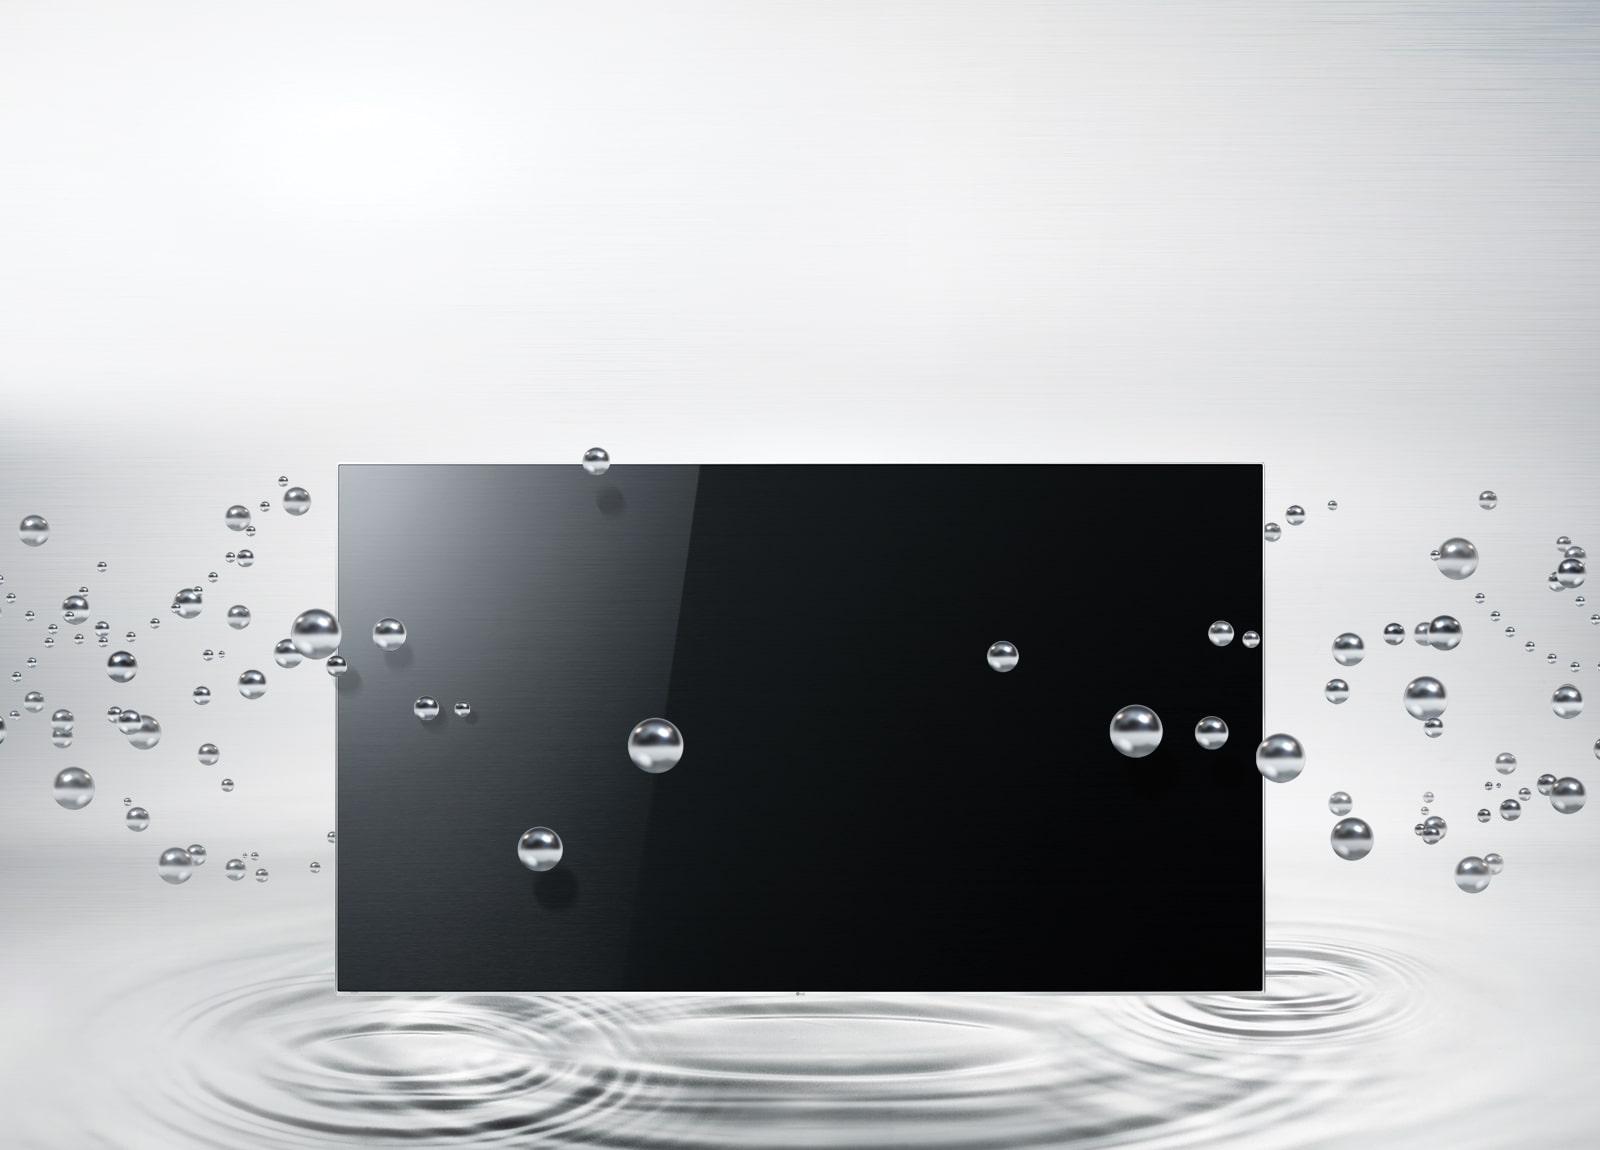 Sound designed by harman/kardonเสียงทีวีคุณภาพ ที่ปรับแต่งร่วมกับ แบรนด์เครื่องเสียงHi-end อย่าง harman/kardon®